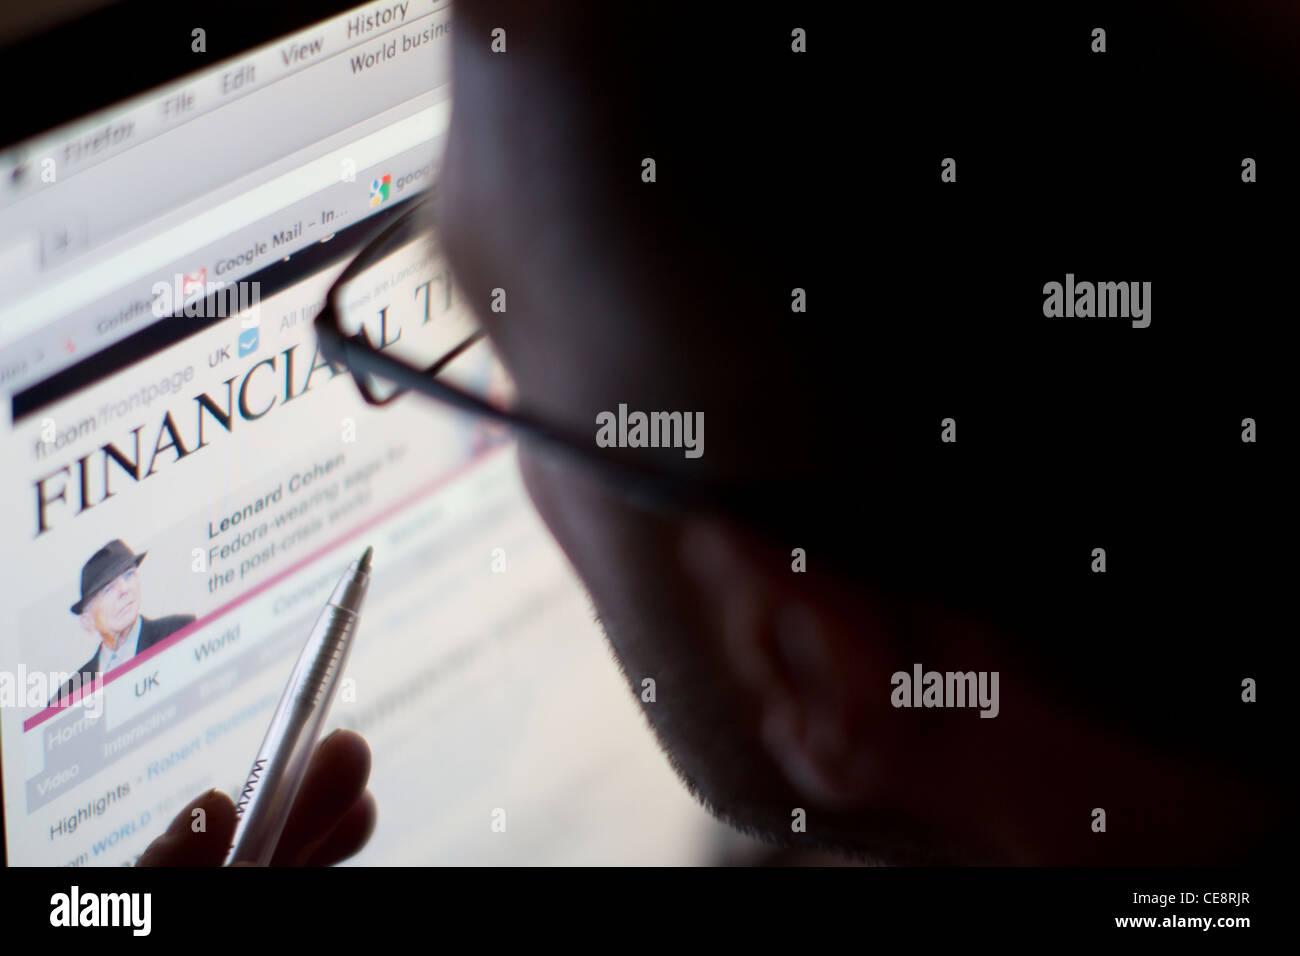 financial times online website web - Stock Image